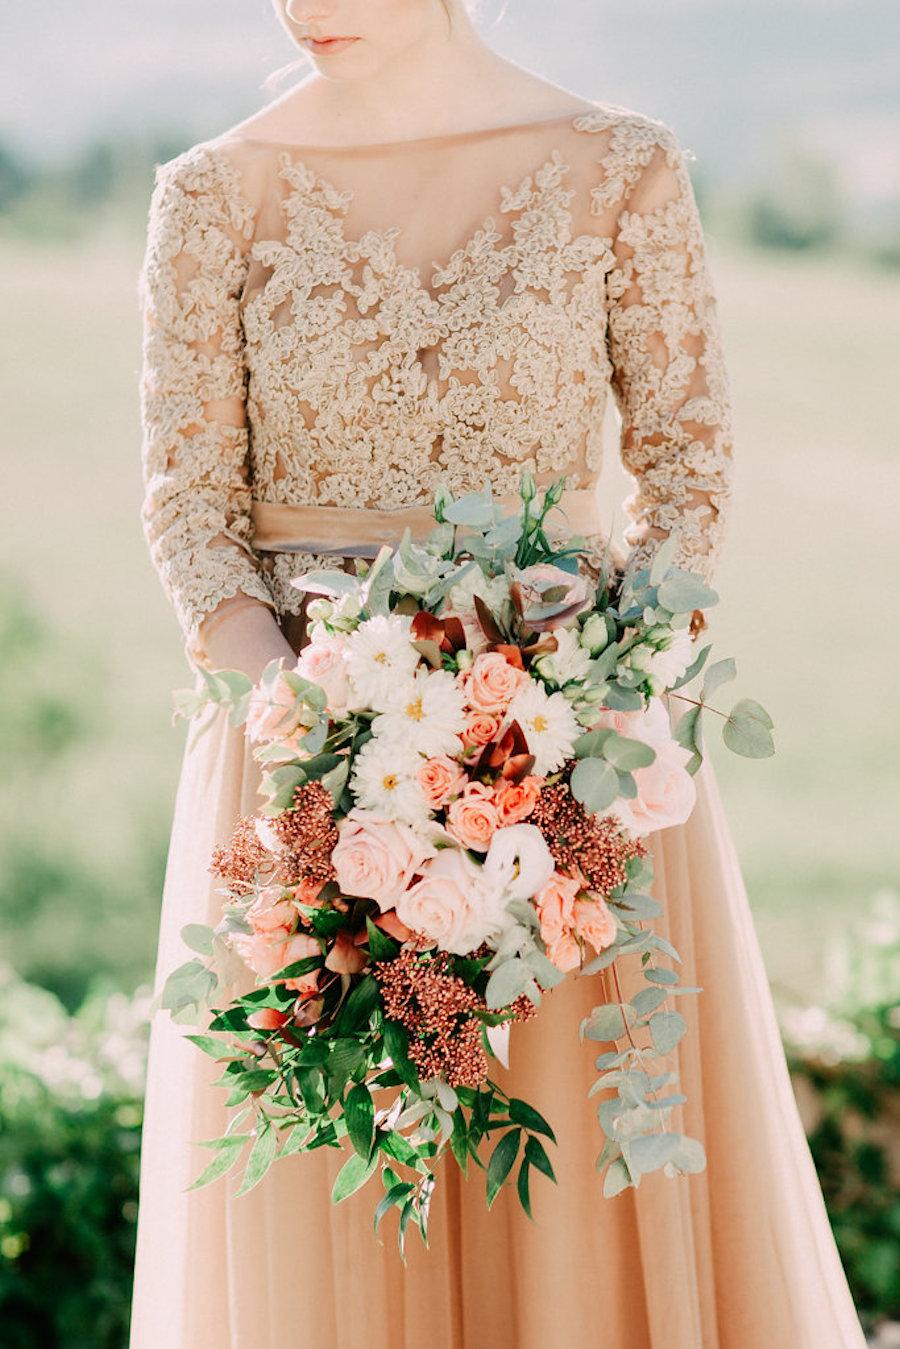 bouquet con dalie, lisianthus e rose avalance